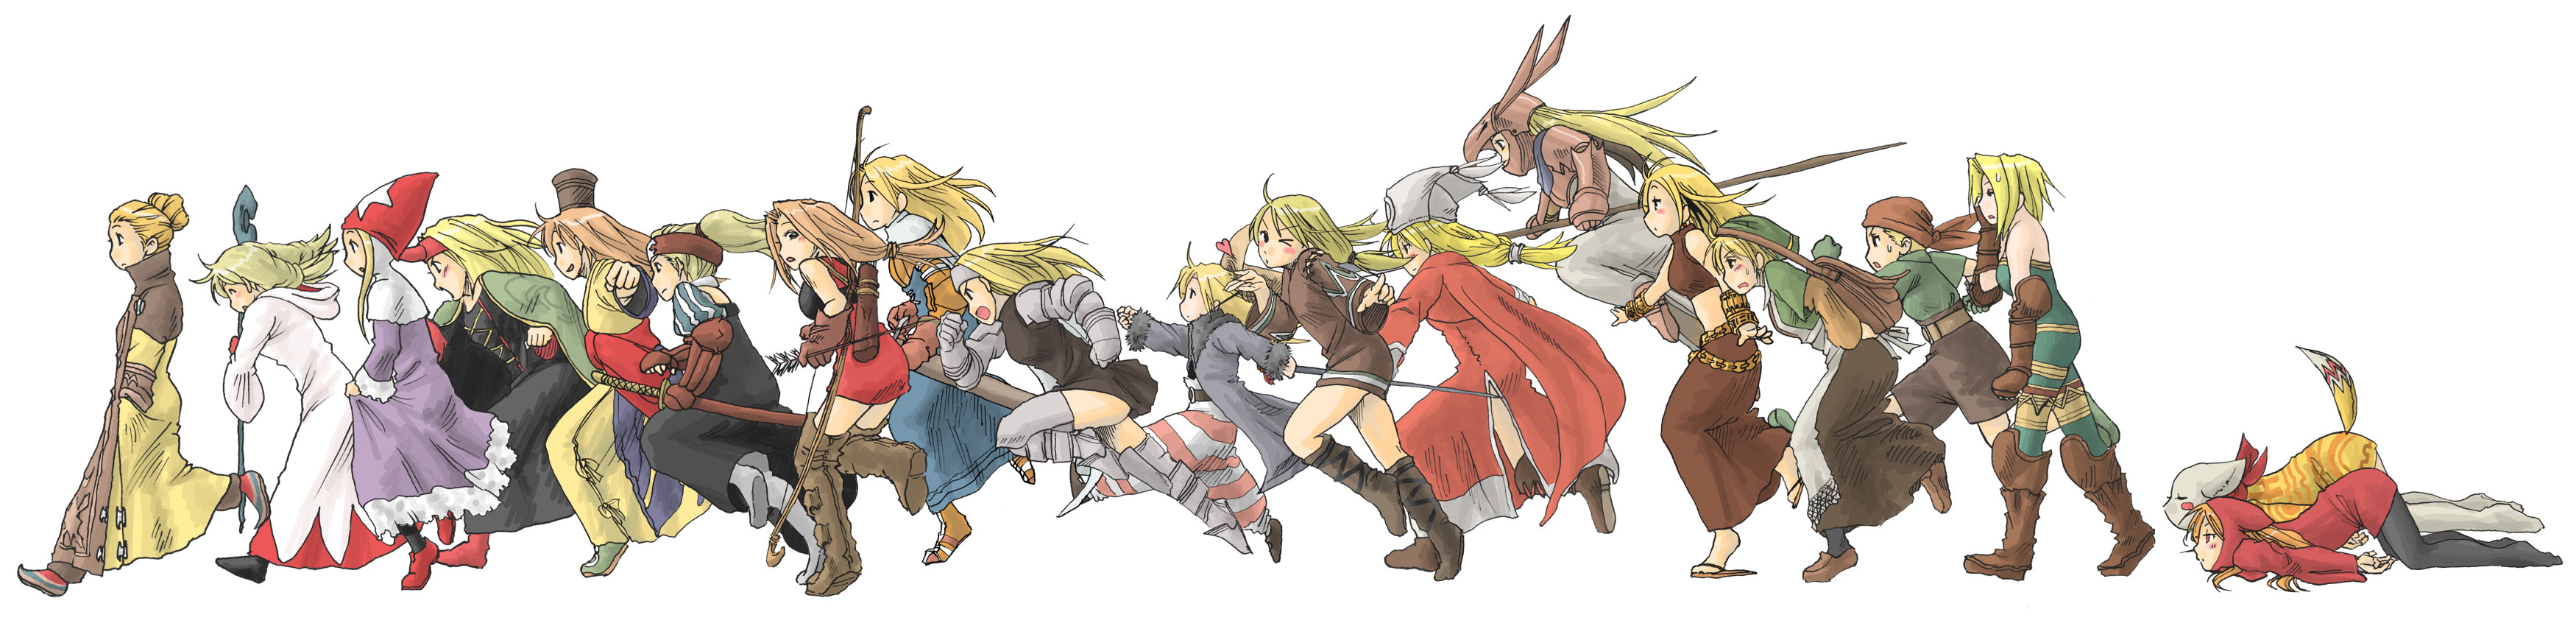 Final Fantasy Tactics Wallpapers Video Game Hq Final Fantasy